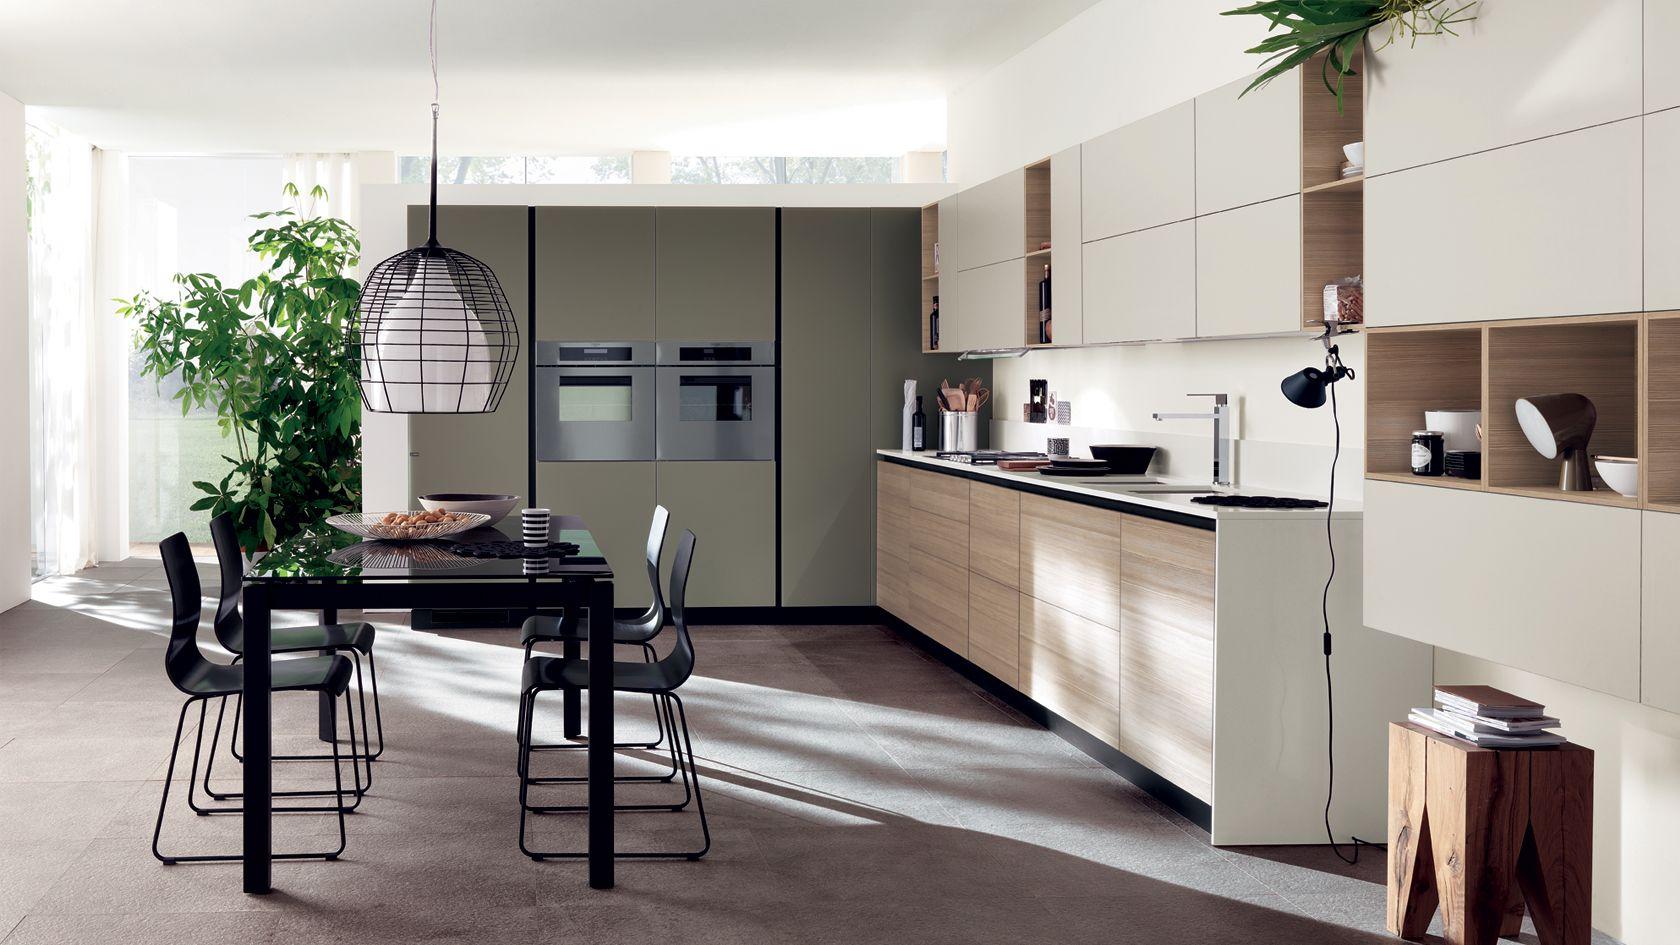 Cucina LiberaMente | Sito ufficiale Scavolini | Cucine Moderne ...